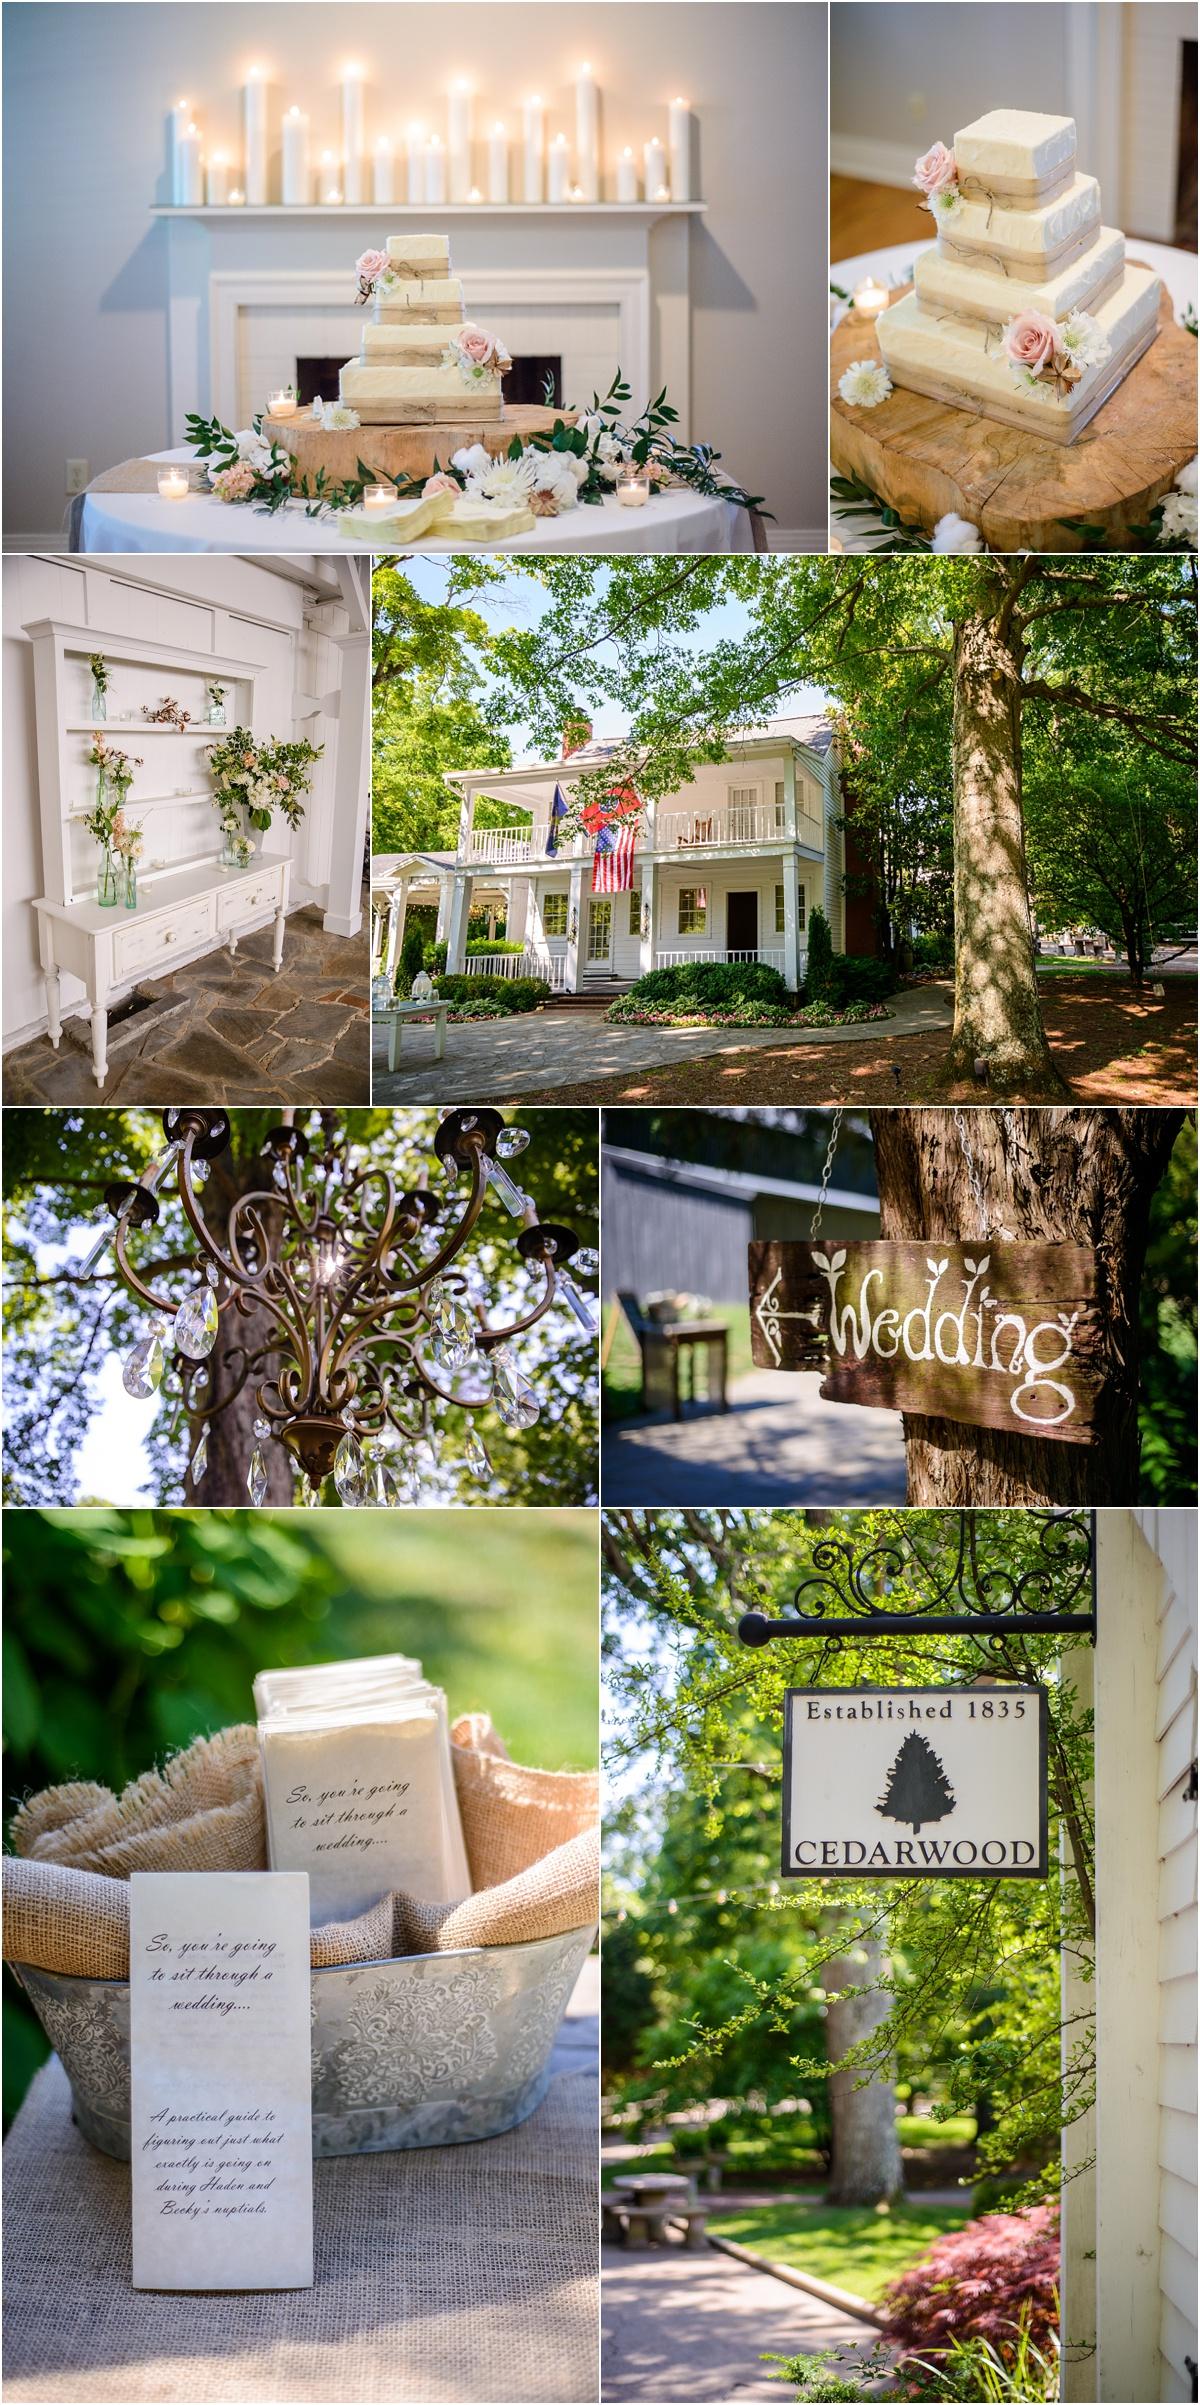 Greg Smit Photography Nashville wedding photographer Cedarwood Weddings_0038